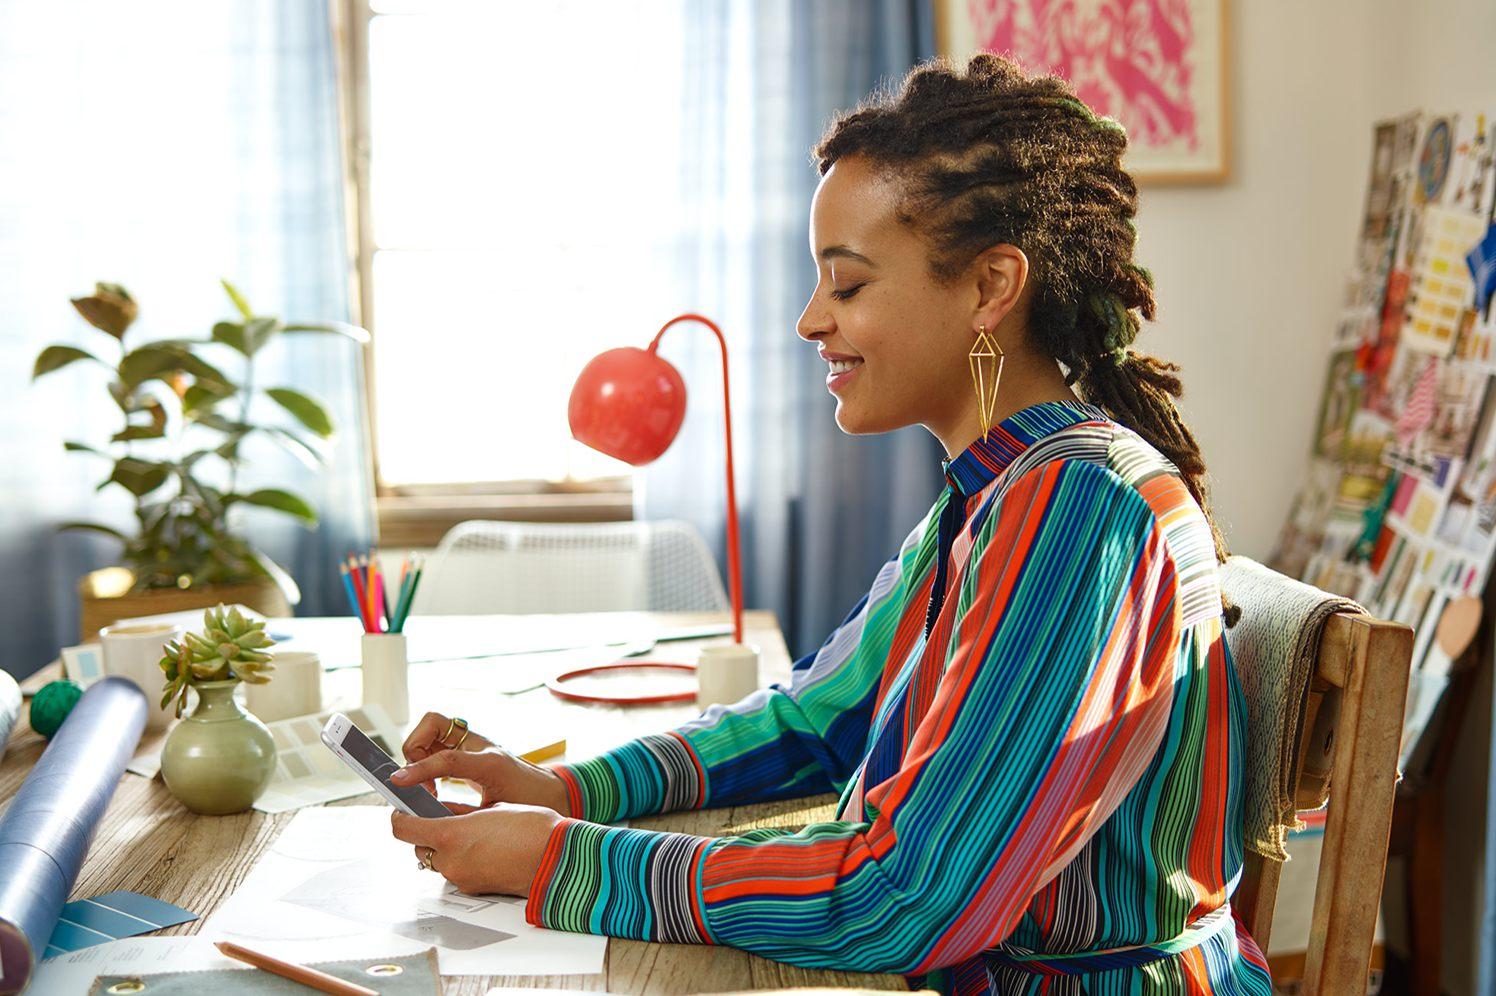 interior designer on her smart phone using square